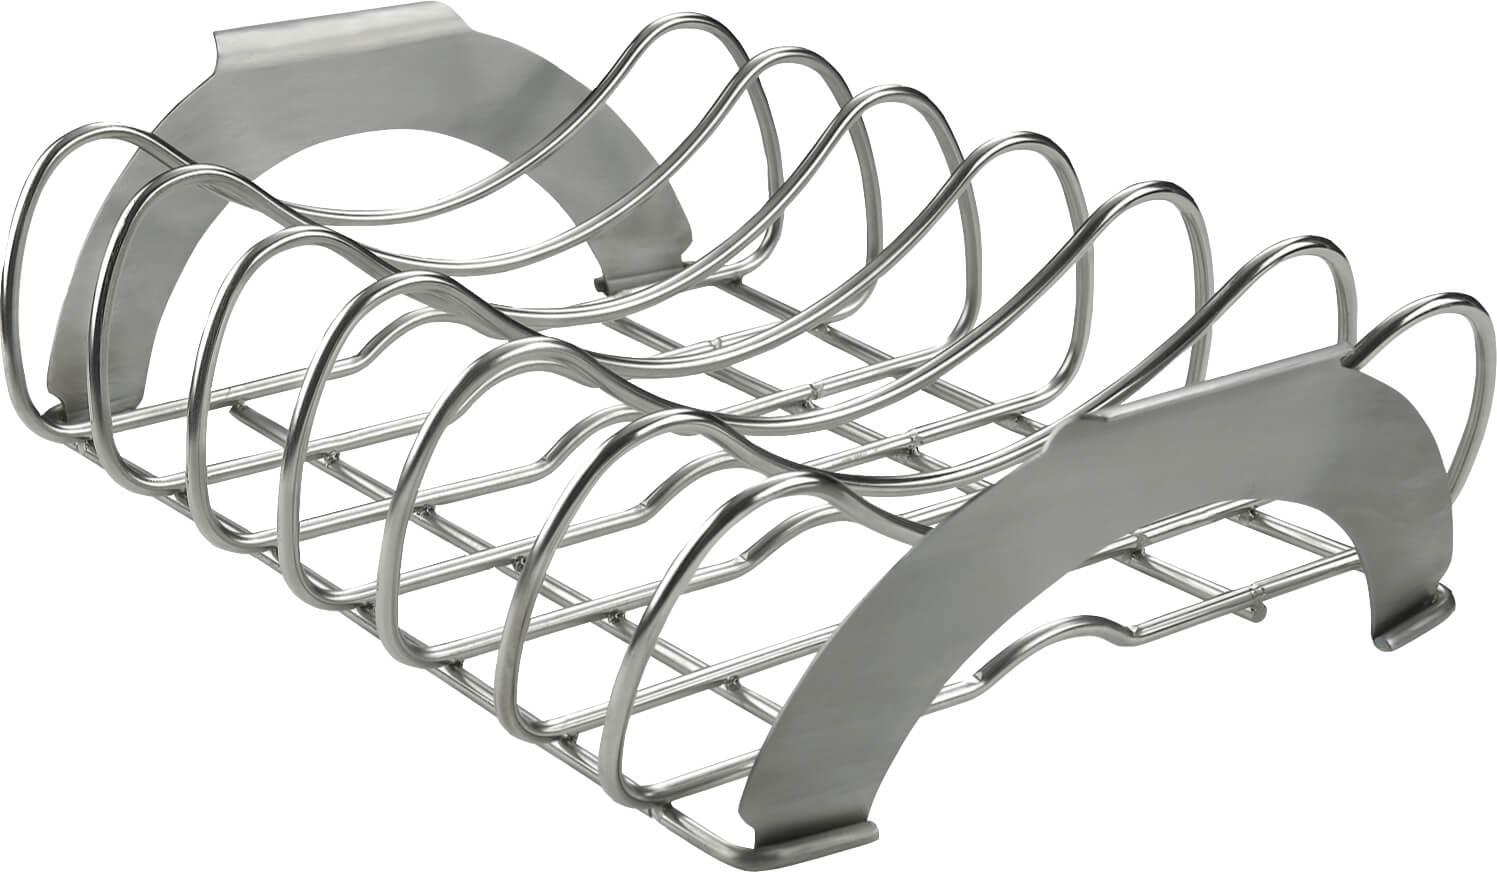 PRO Stainless Steel Rib Rack